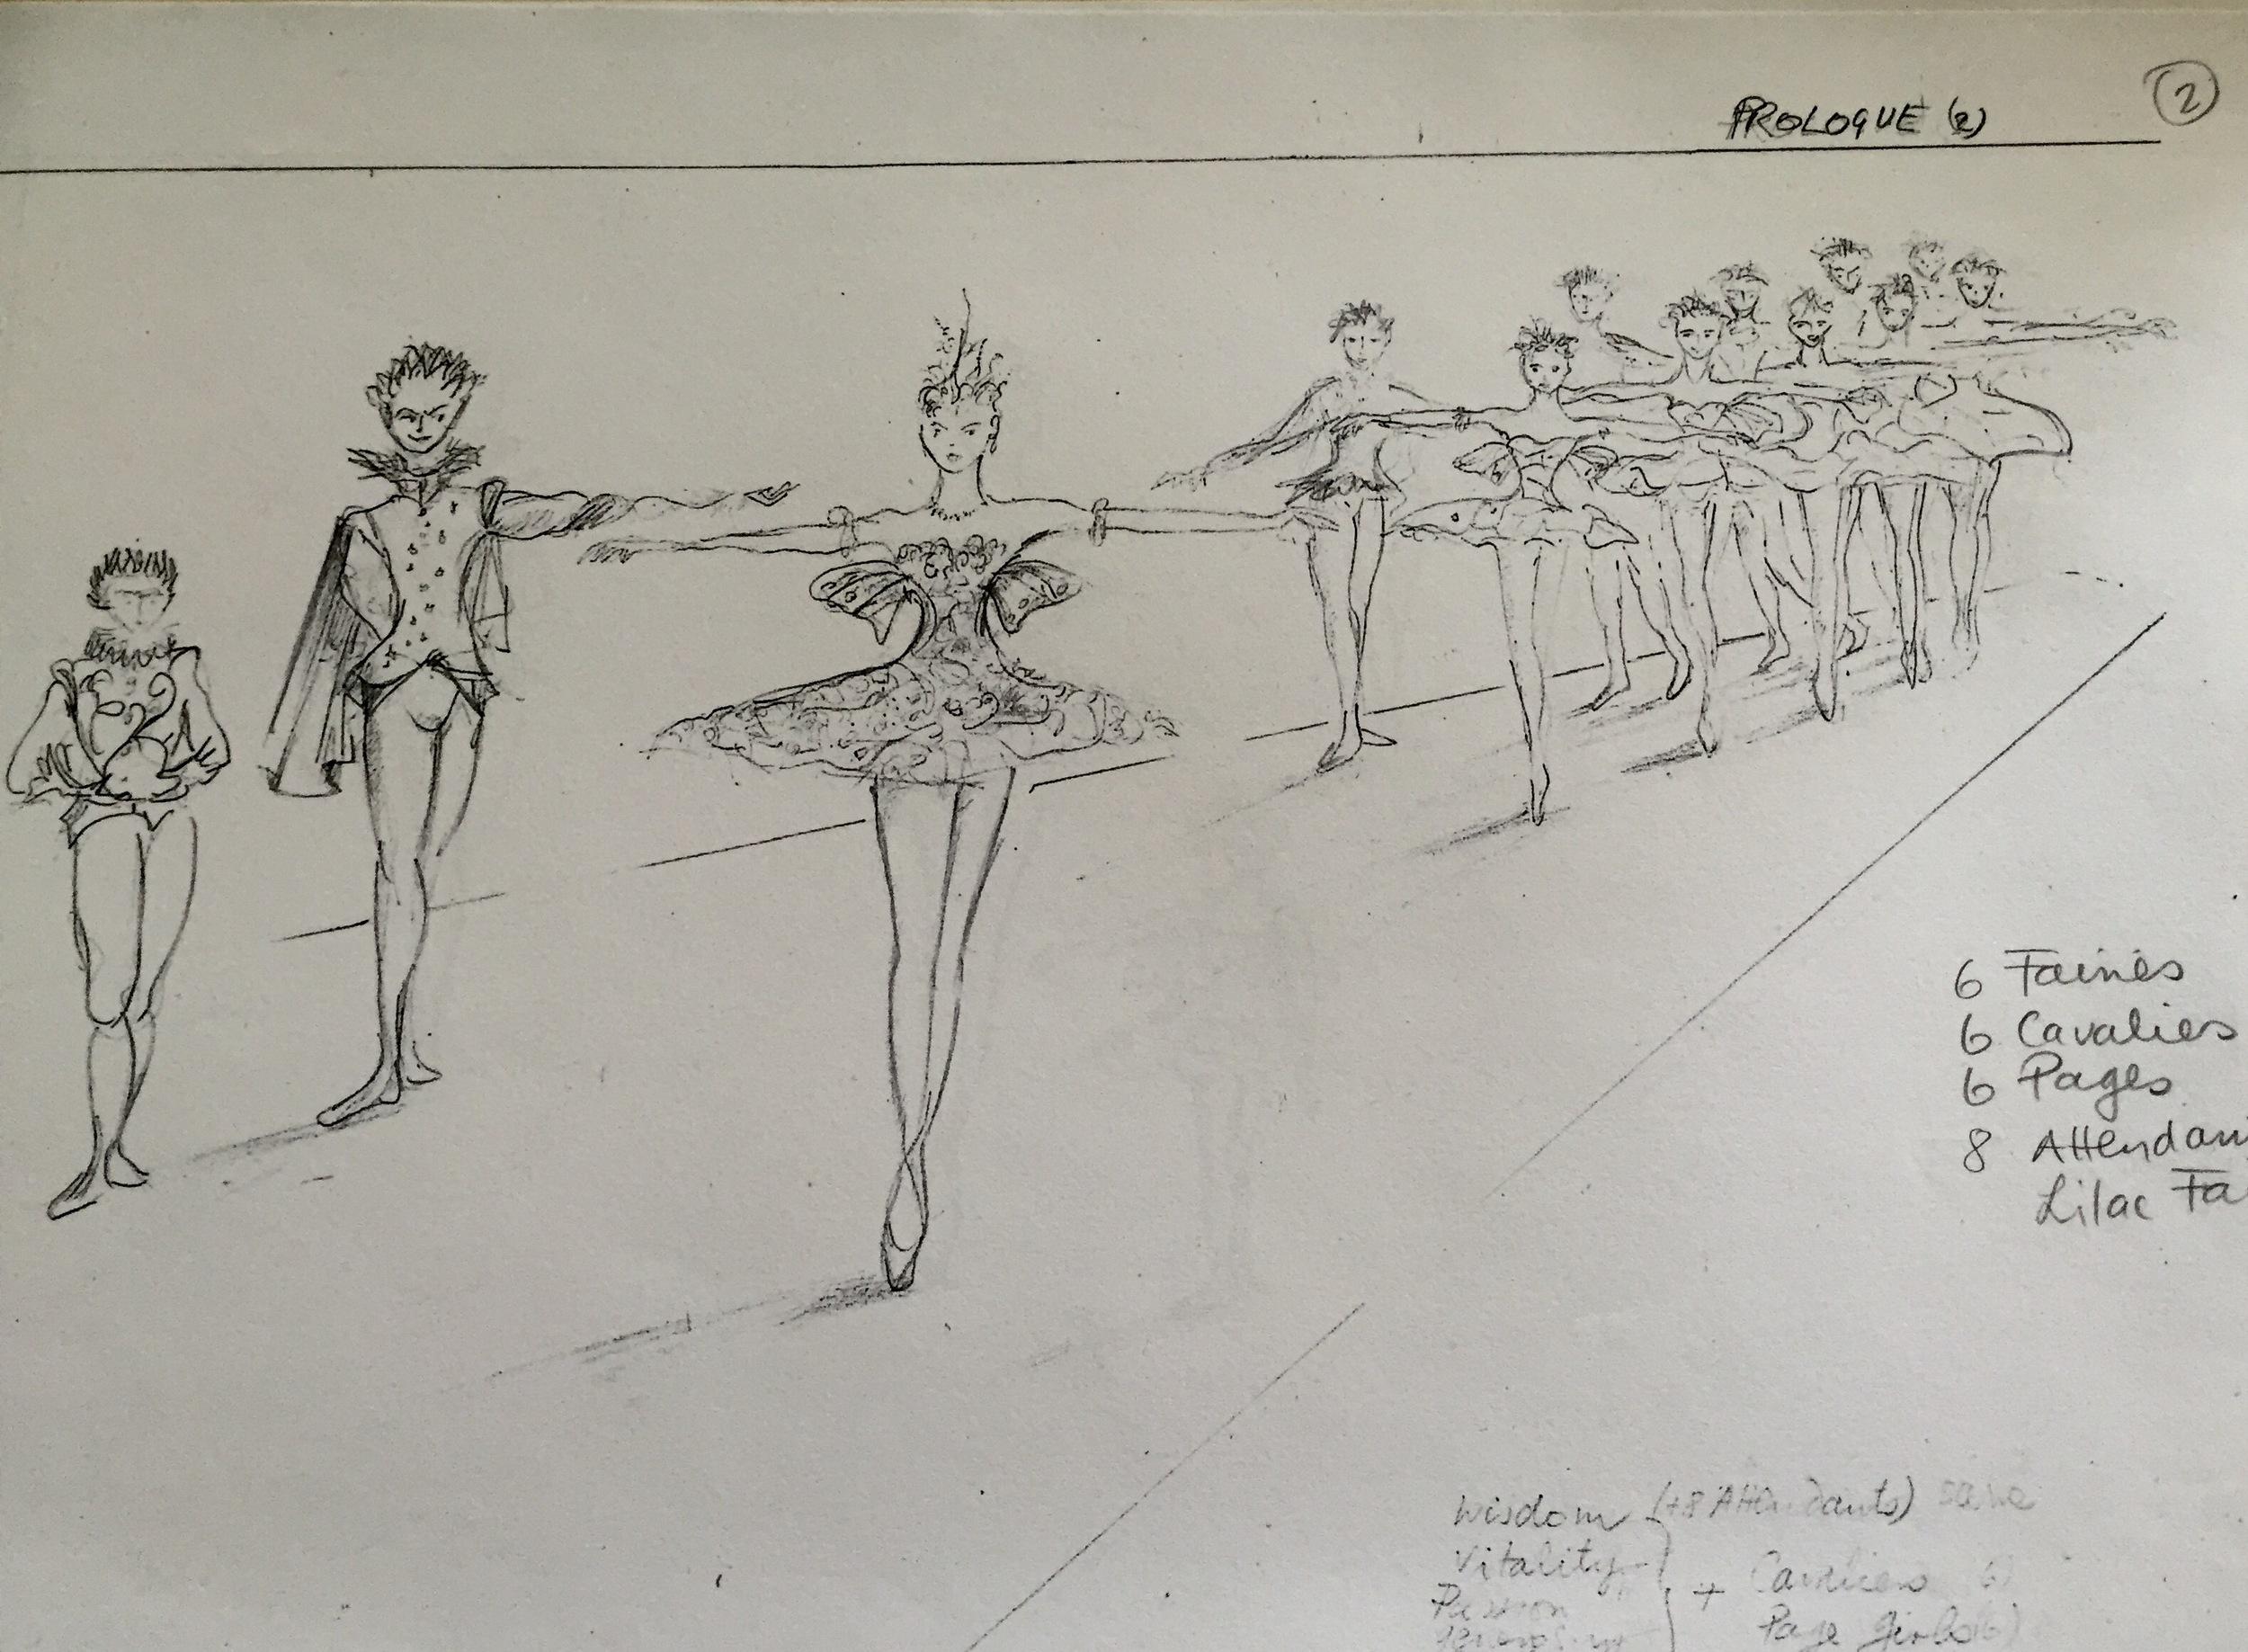 Sleeping Beauty ballet - producction design - David Roger.jpg